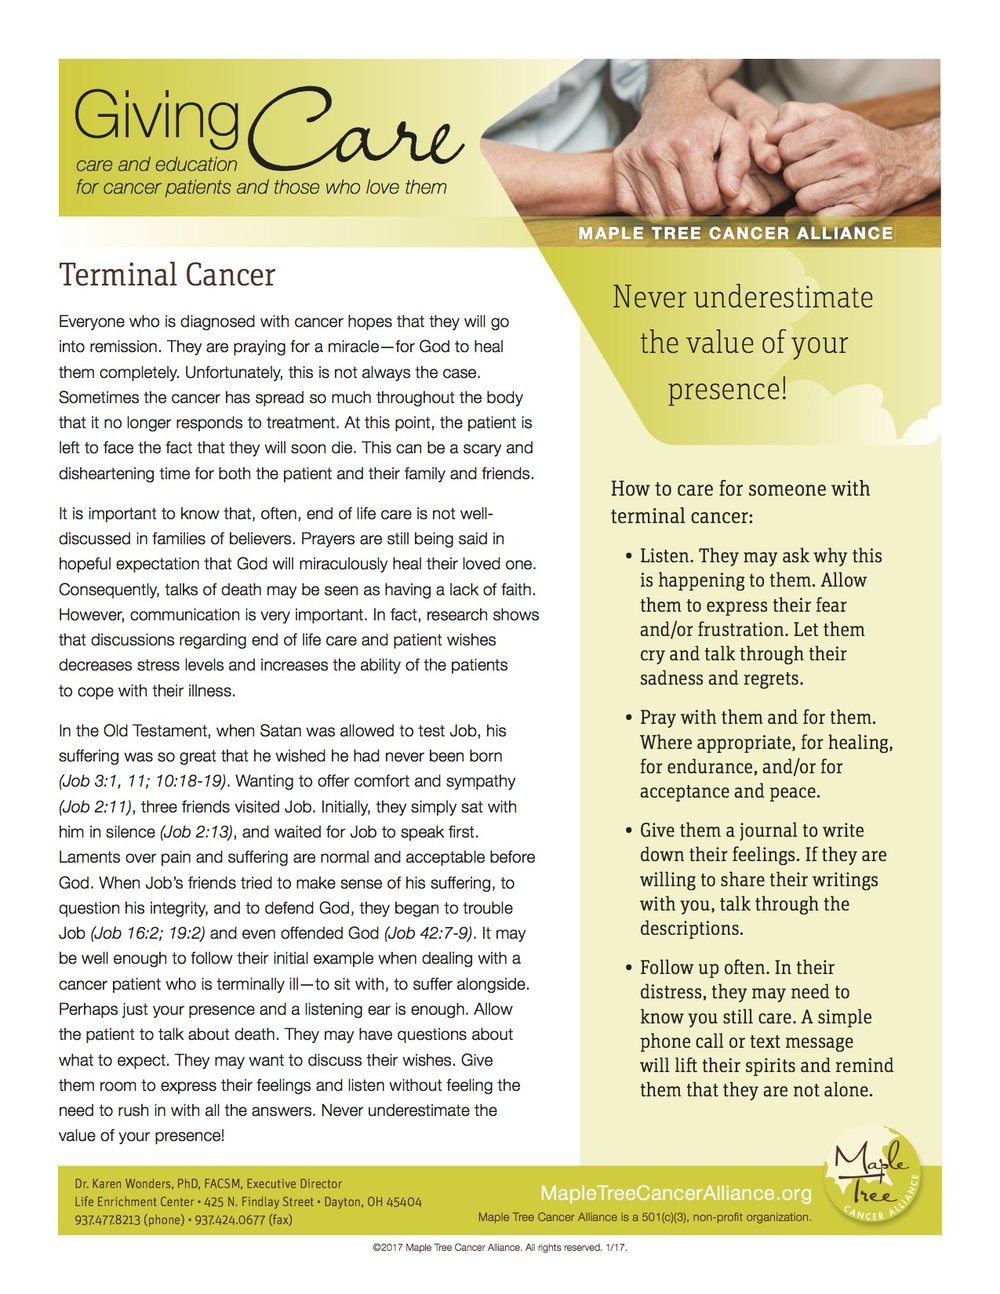 Terminal Cancer_One Sheet.jpg